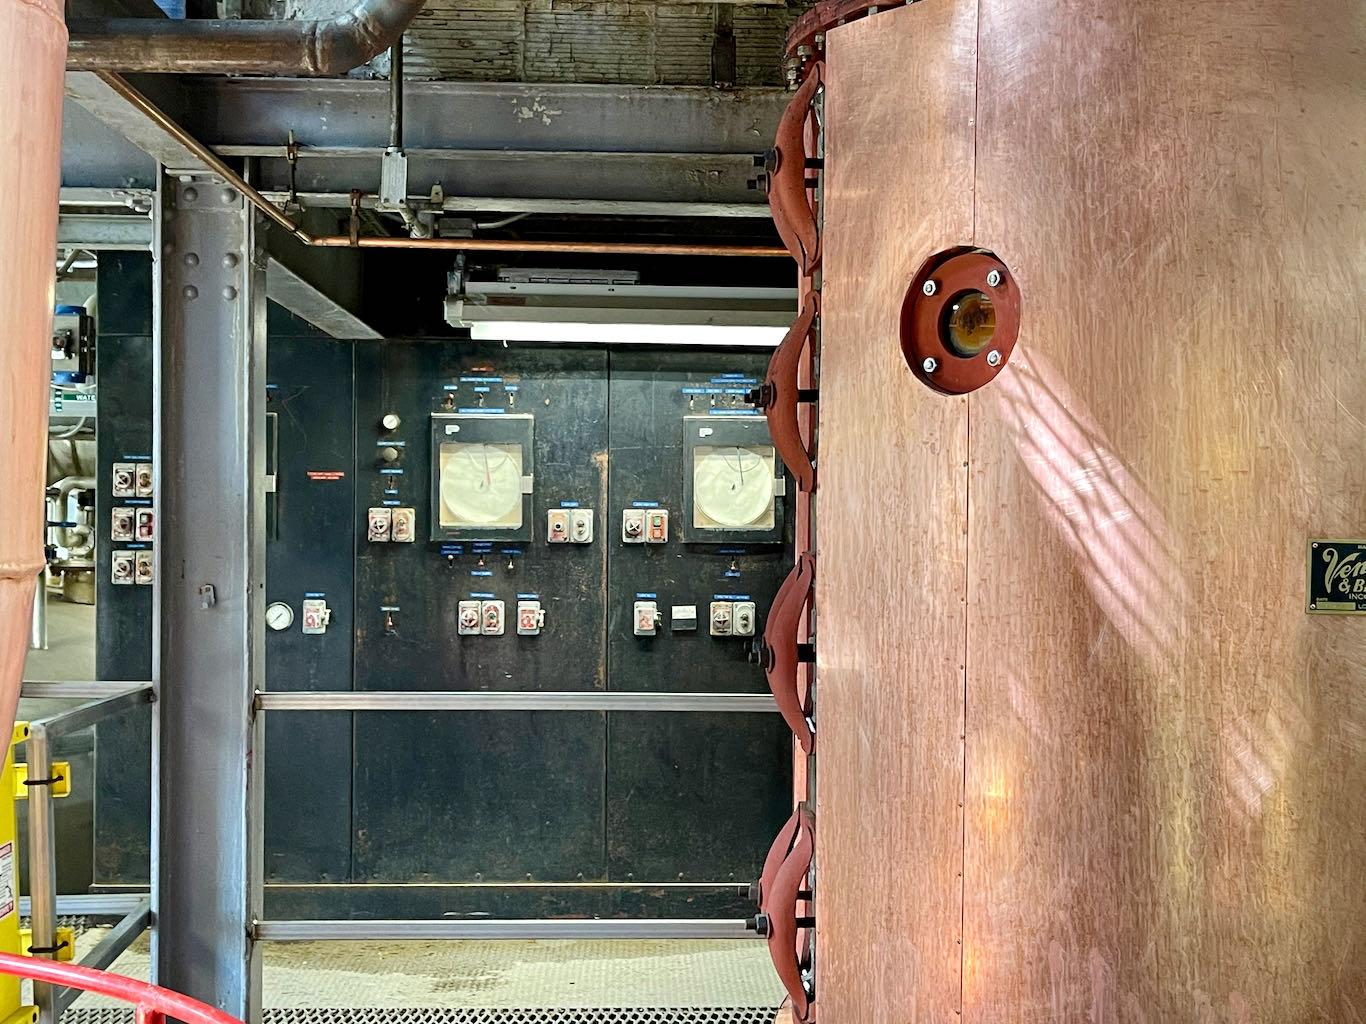 Original Distillery Control Panel - Green River Distilling Co